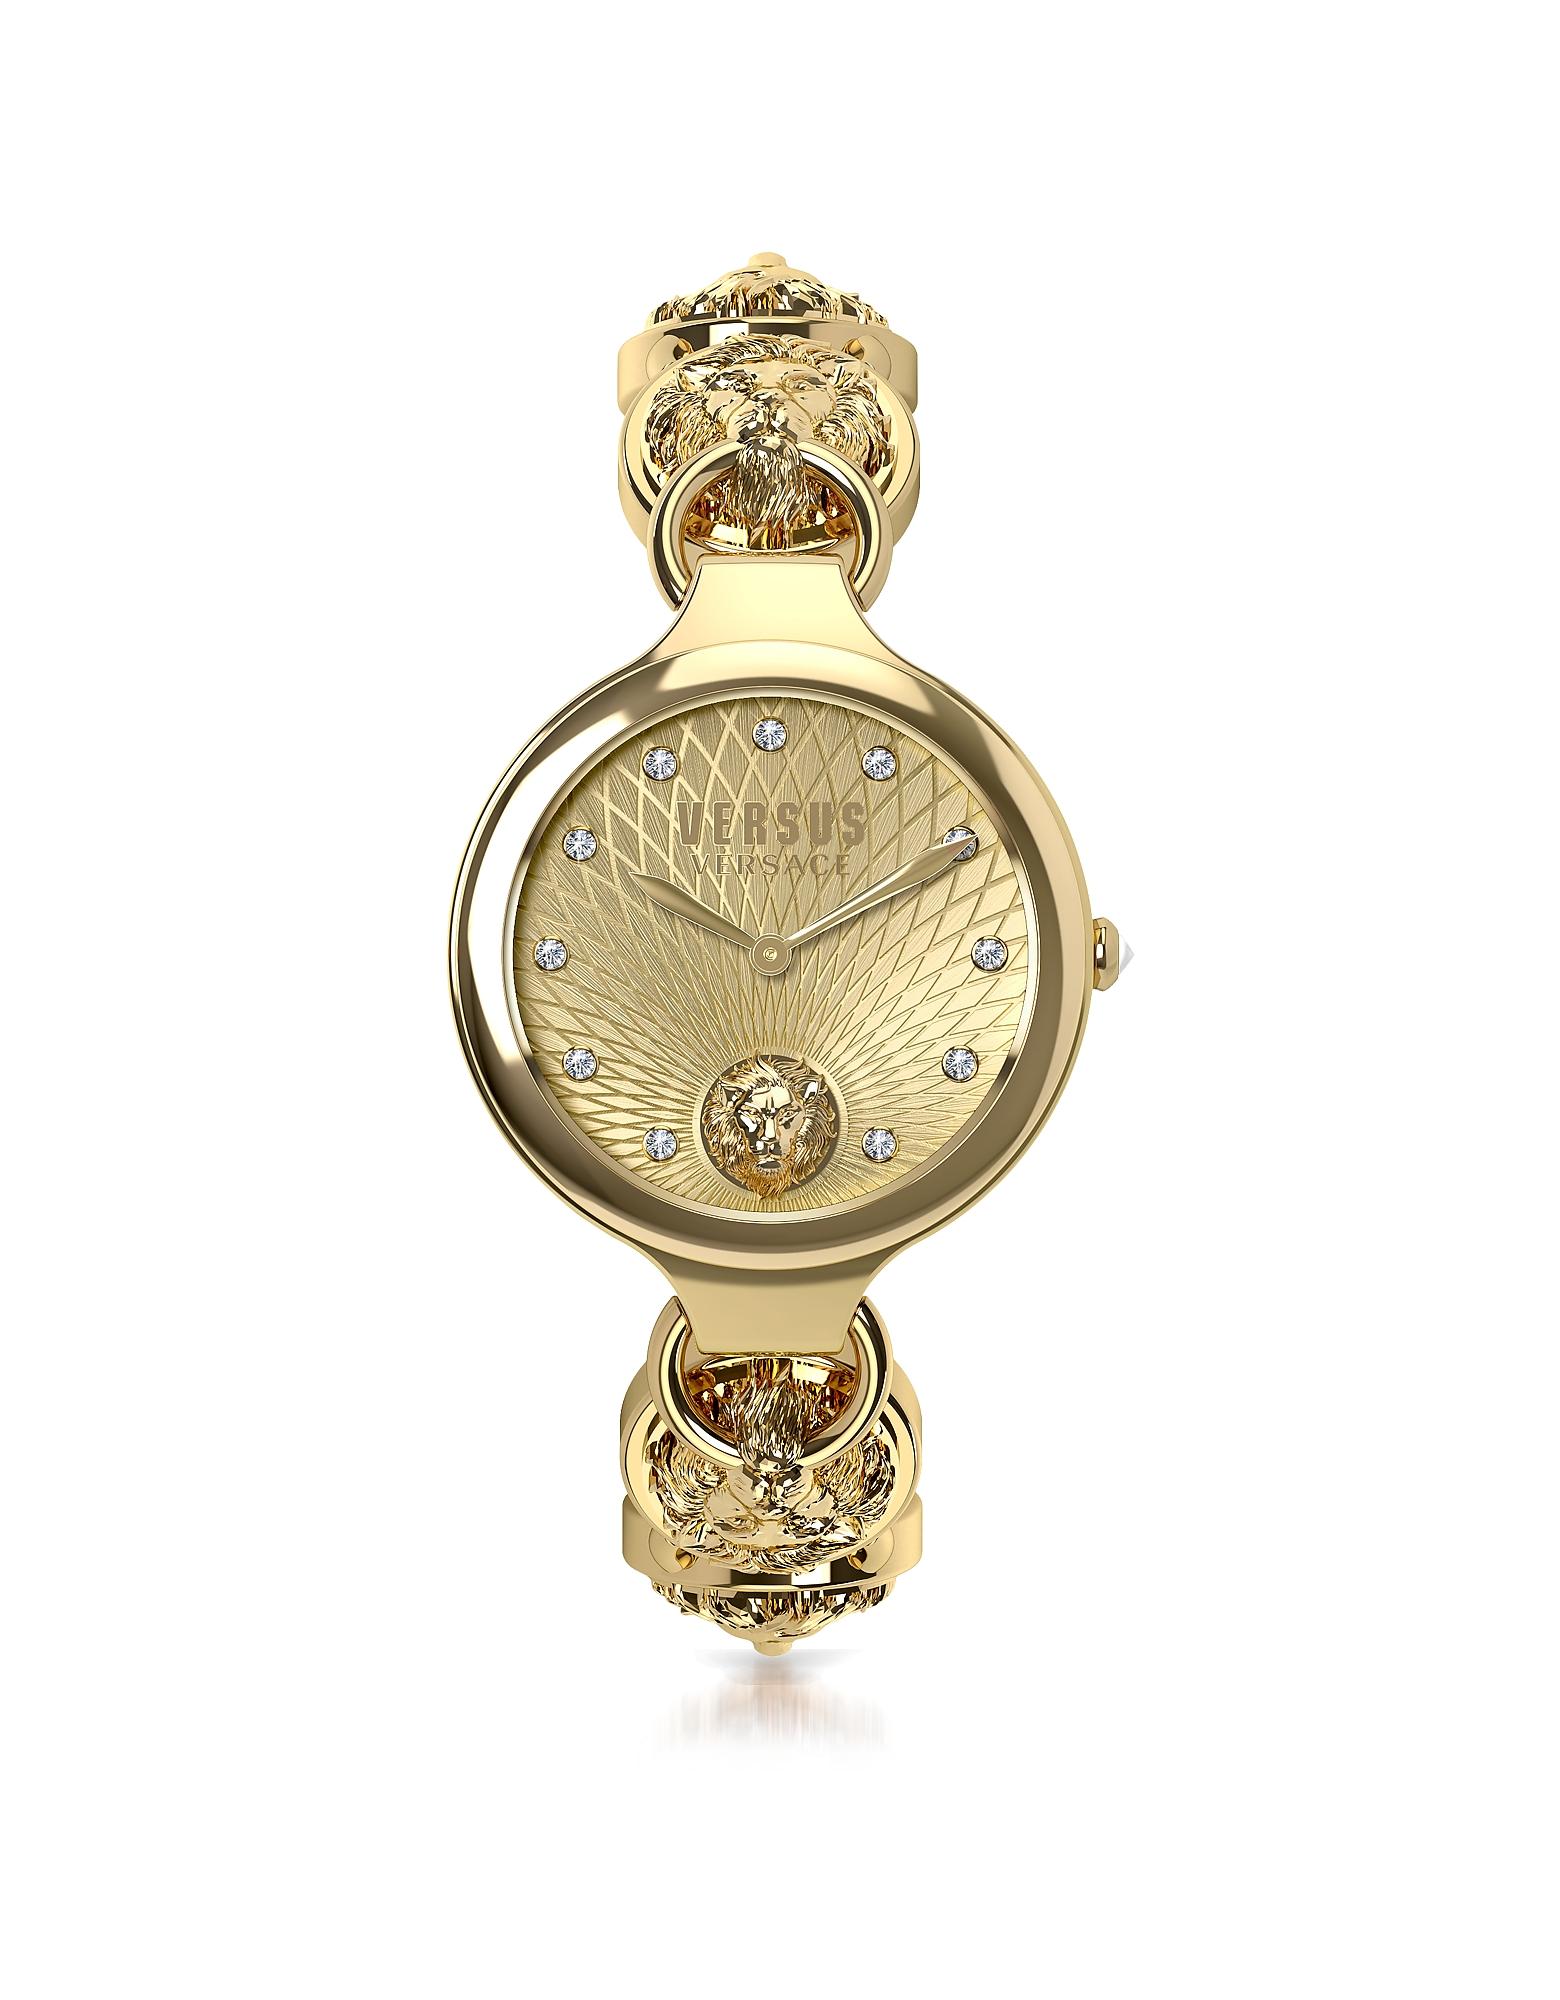 Broadwood Gold Tone Stainless Steel Women's Bracelet Watch w/Crystals